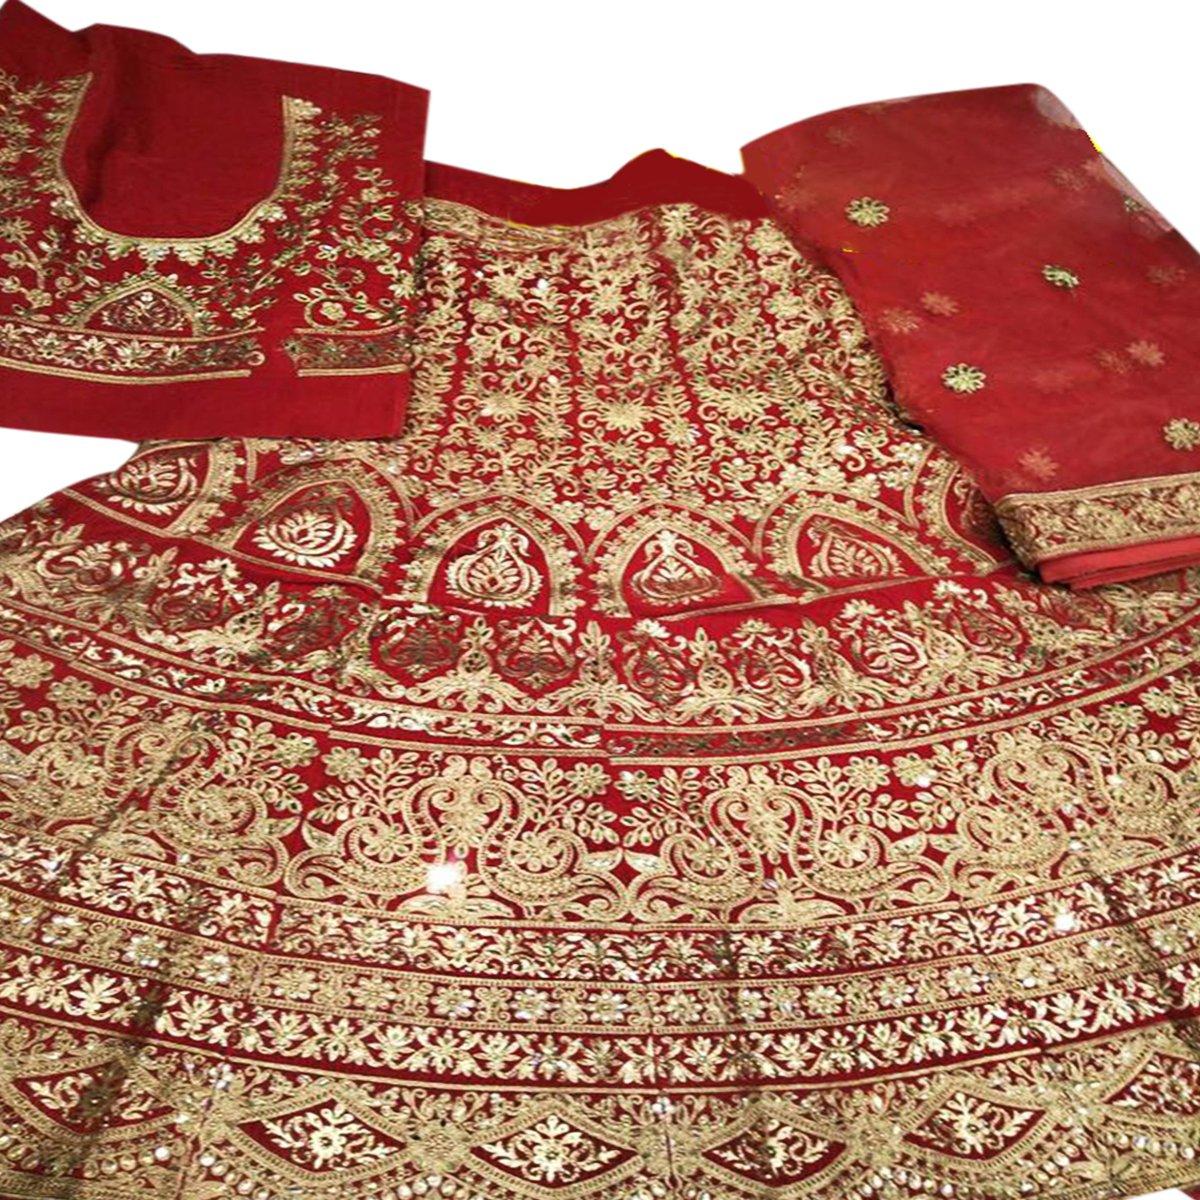 New Designer Ethnic HeaNew Designer Ethnic Heavy Bridal Wedding Women Lehenga Choli Chaniya Choli 608vy Bridal Wedding Women Lehenga Choli Chaniya Choli 608